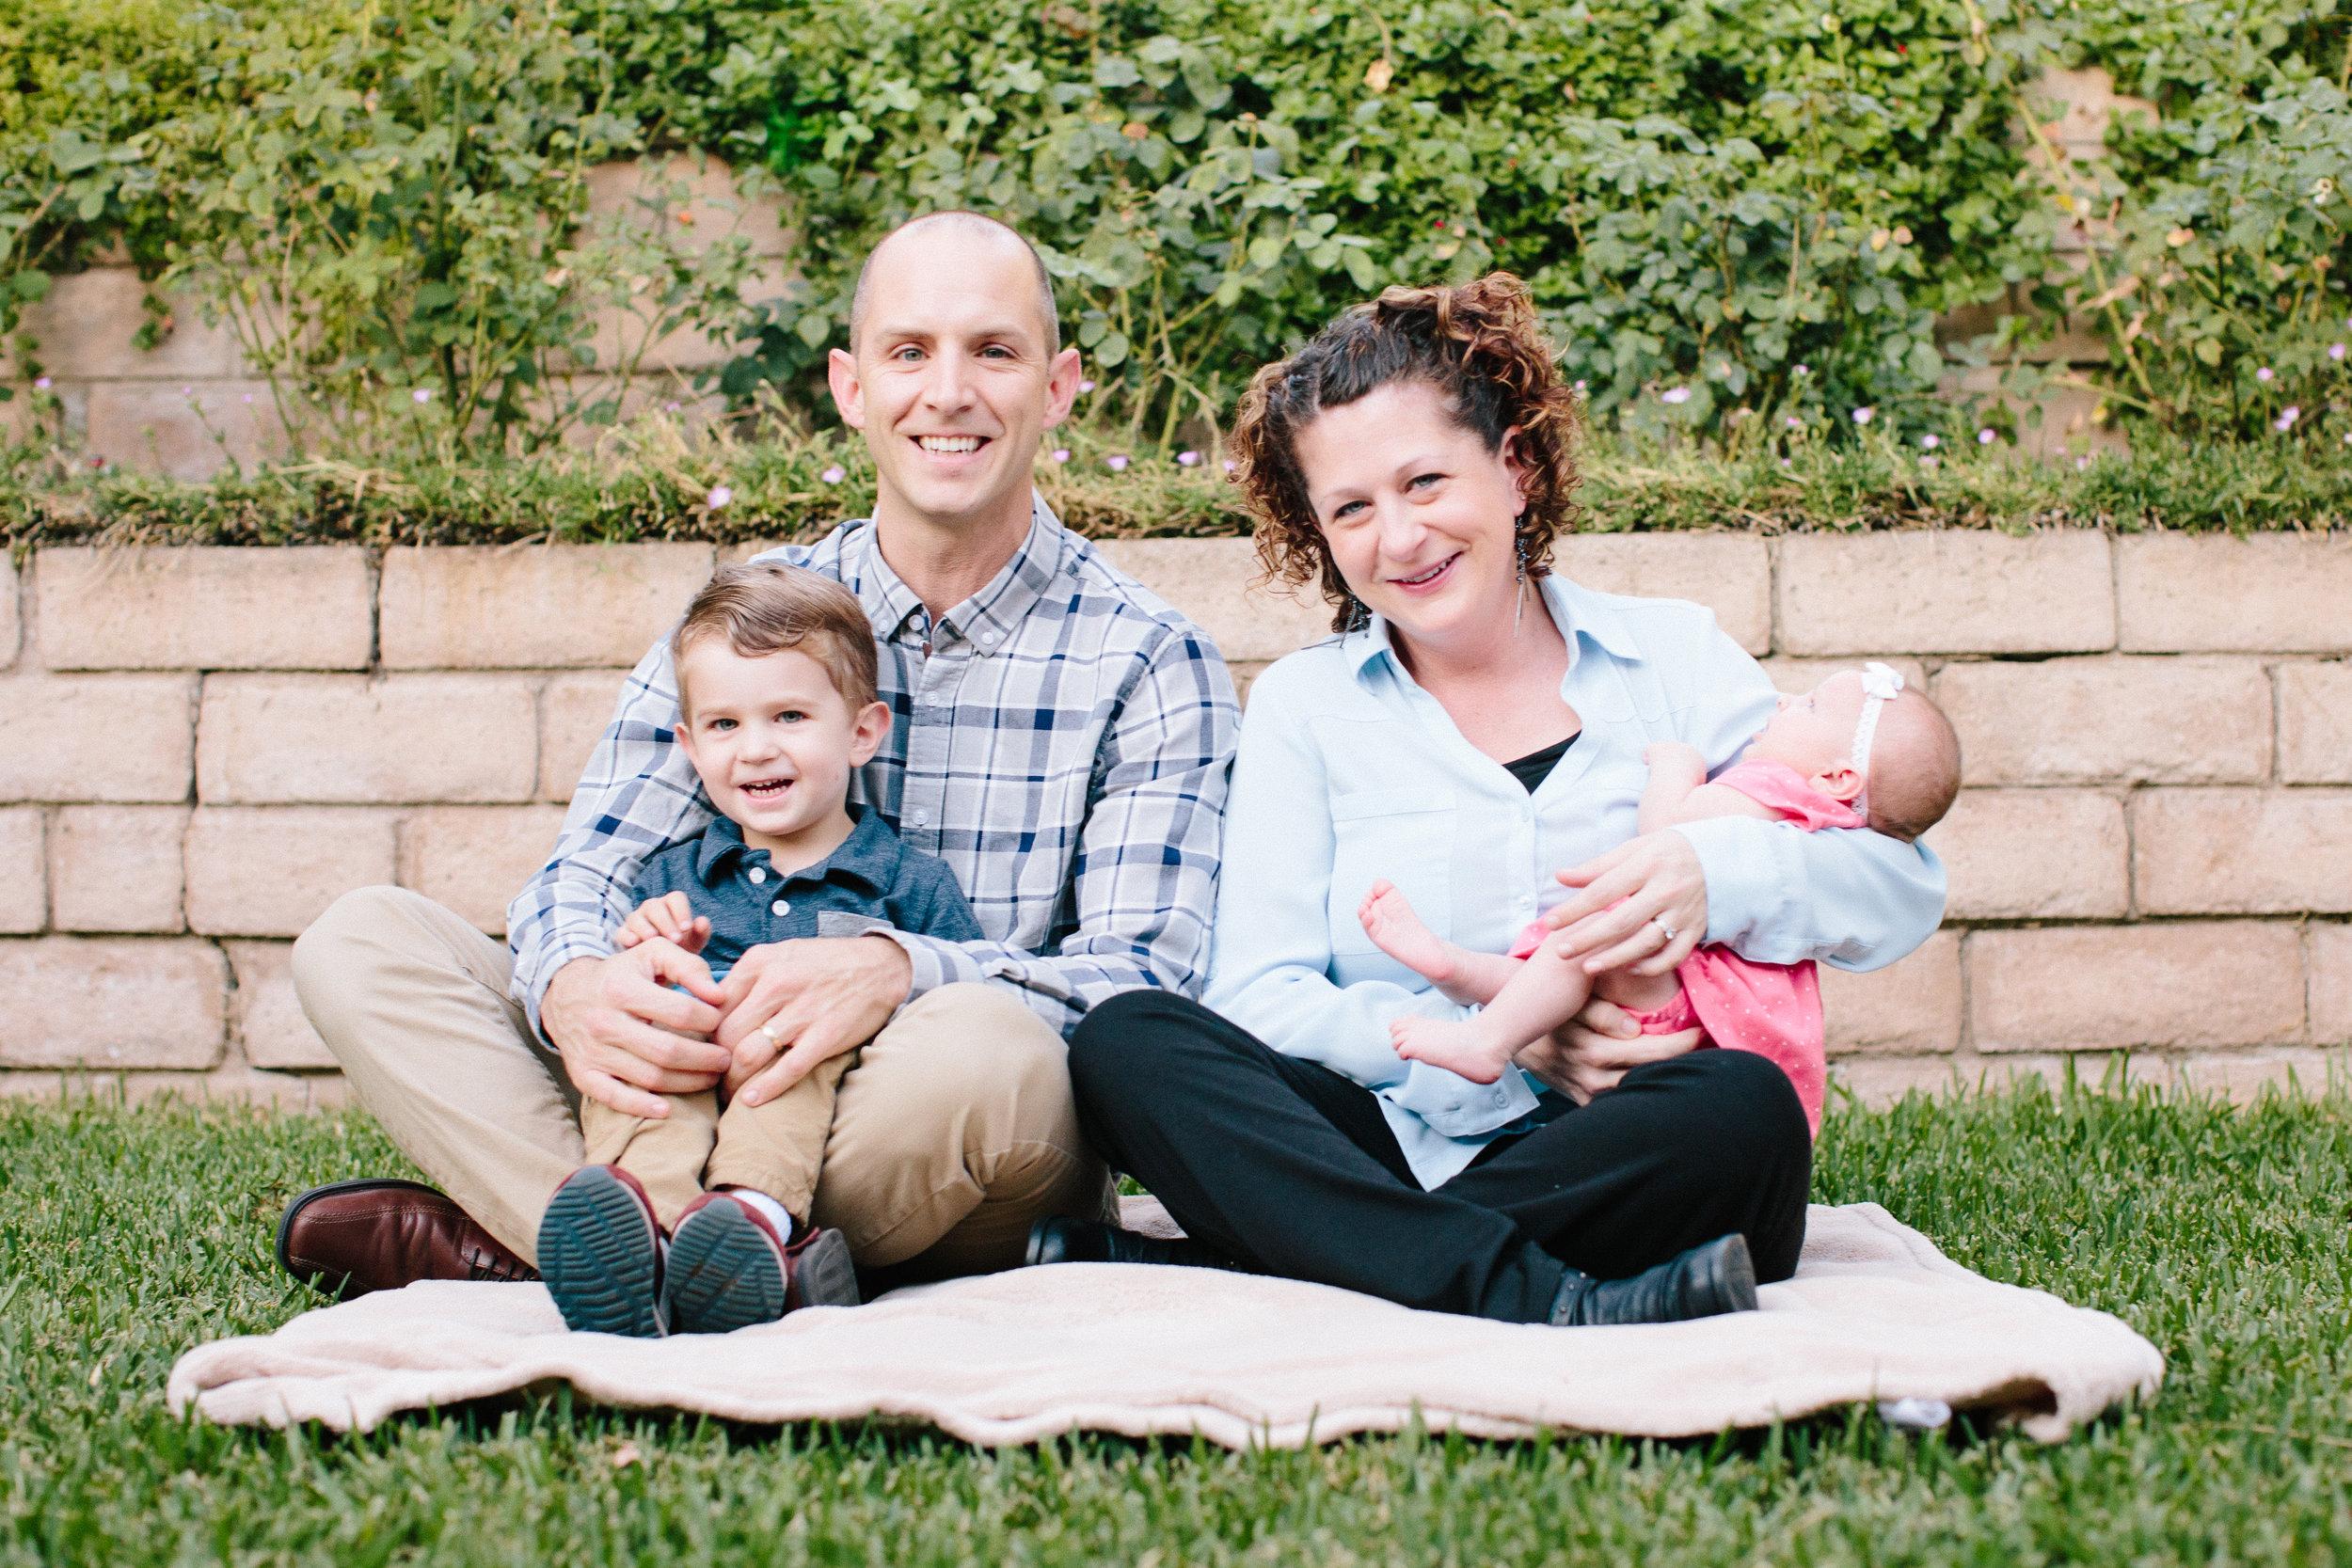 La Cresenta Family Session Mary Graham Photography-1.jpg